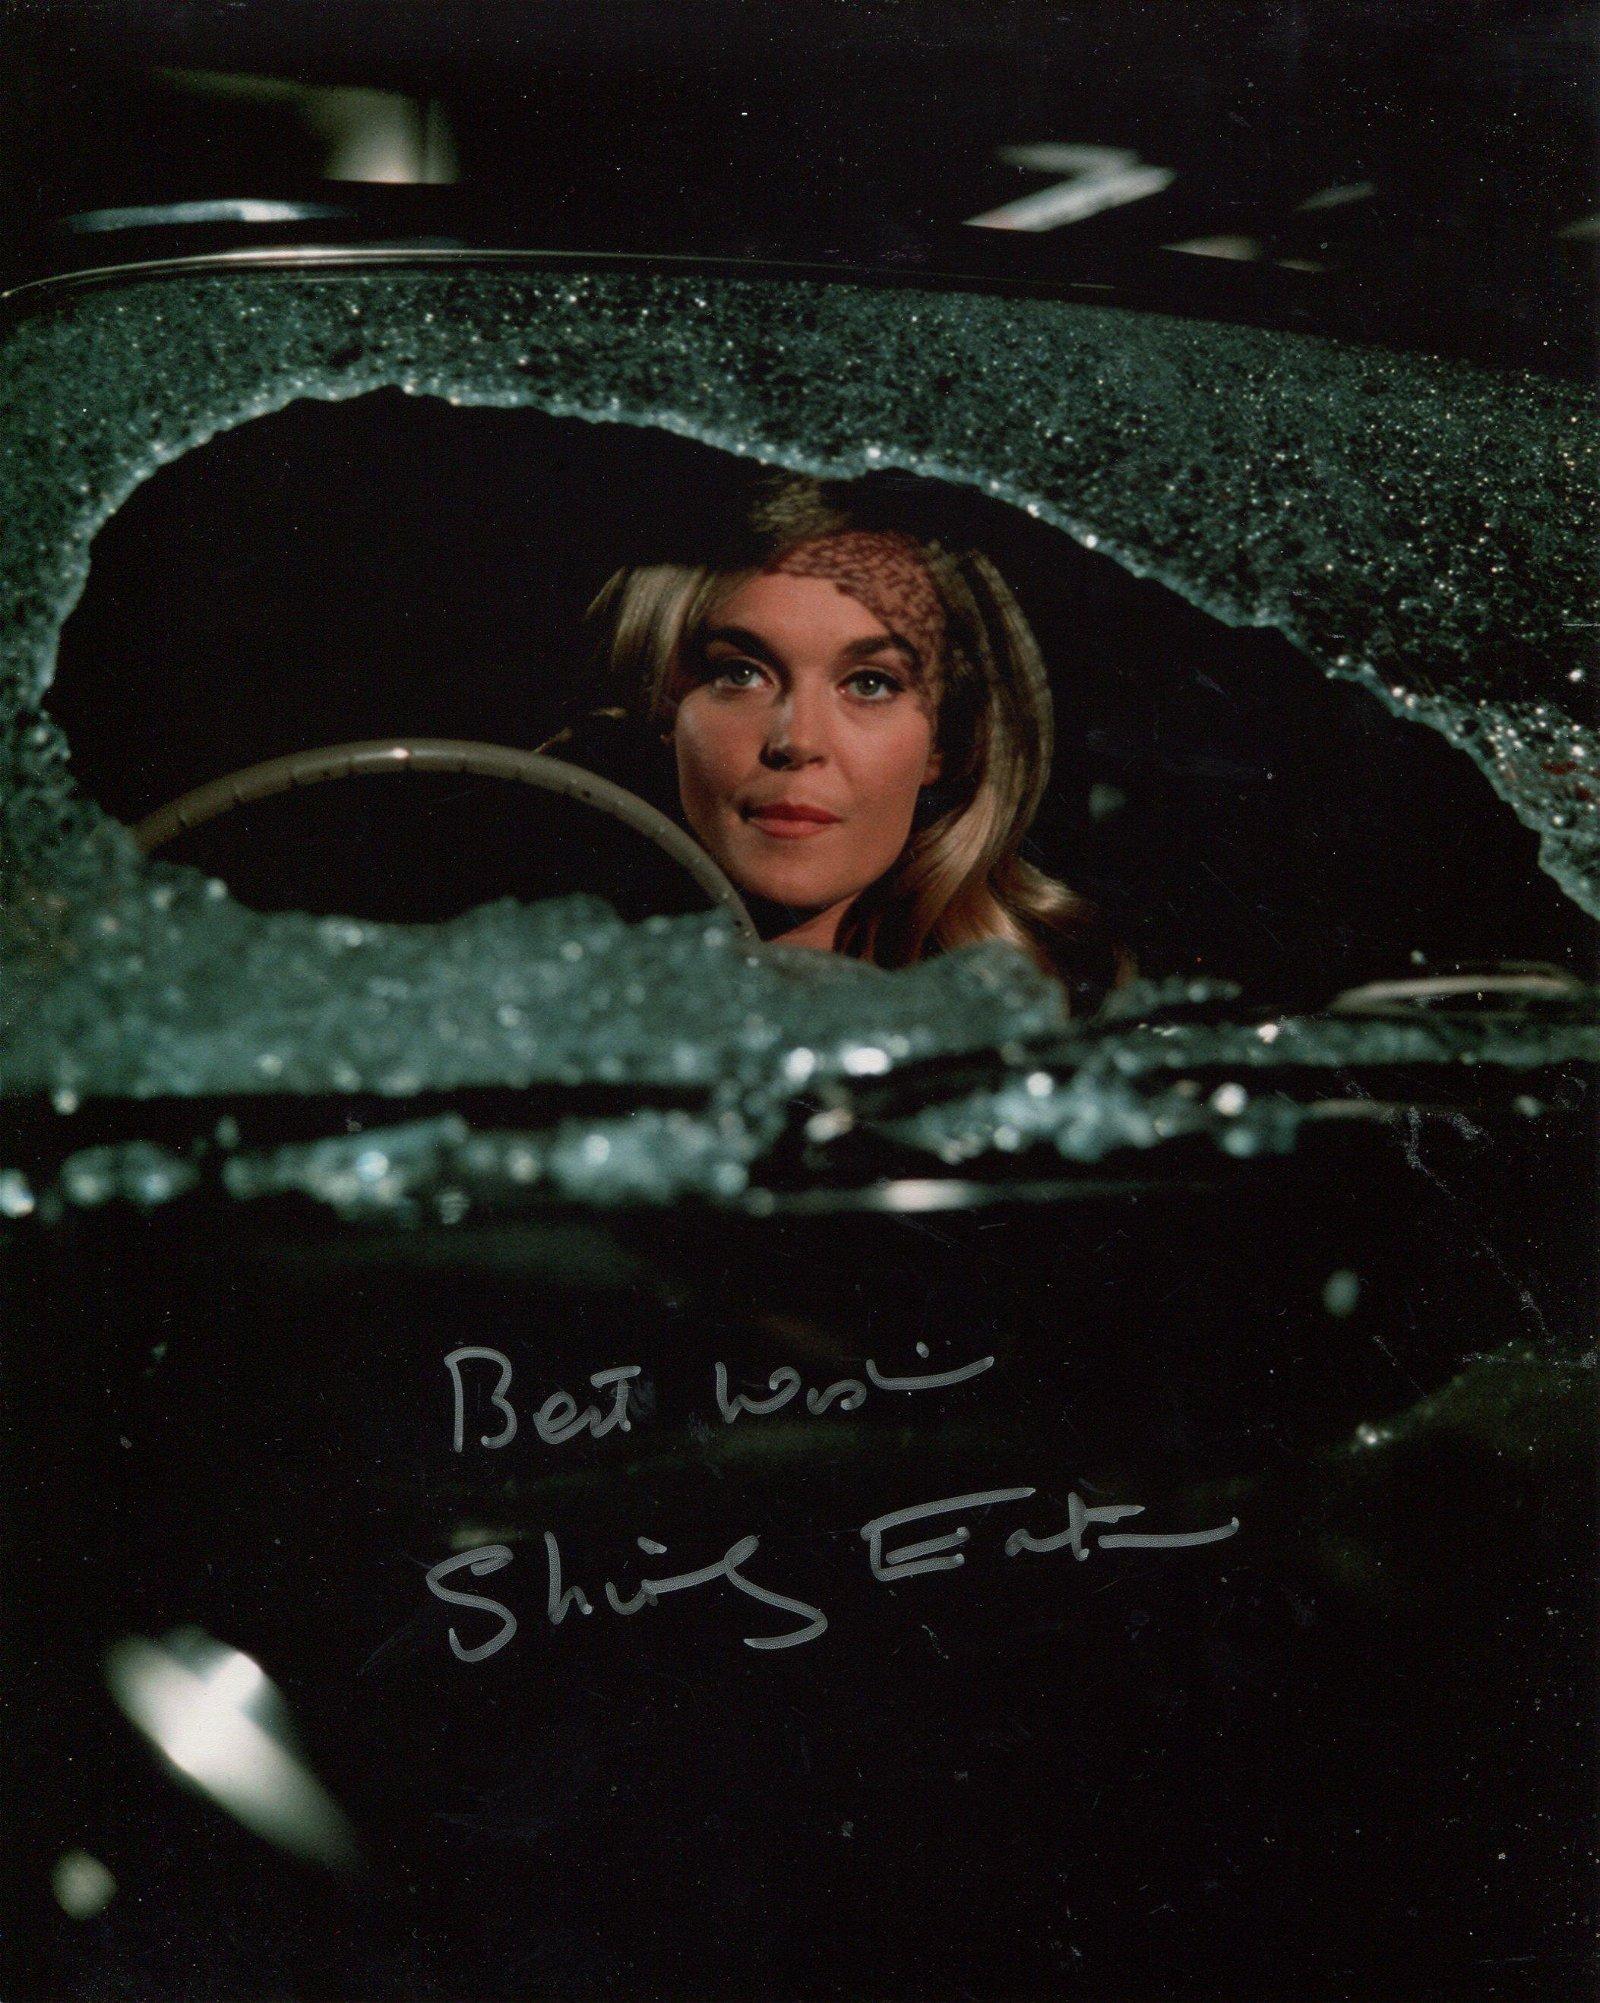 Bond girl. 8x10 inch photo signed by Bond girl Shirley